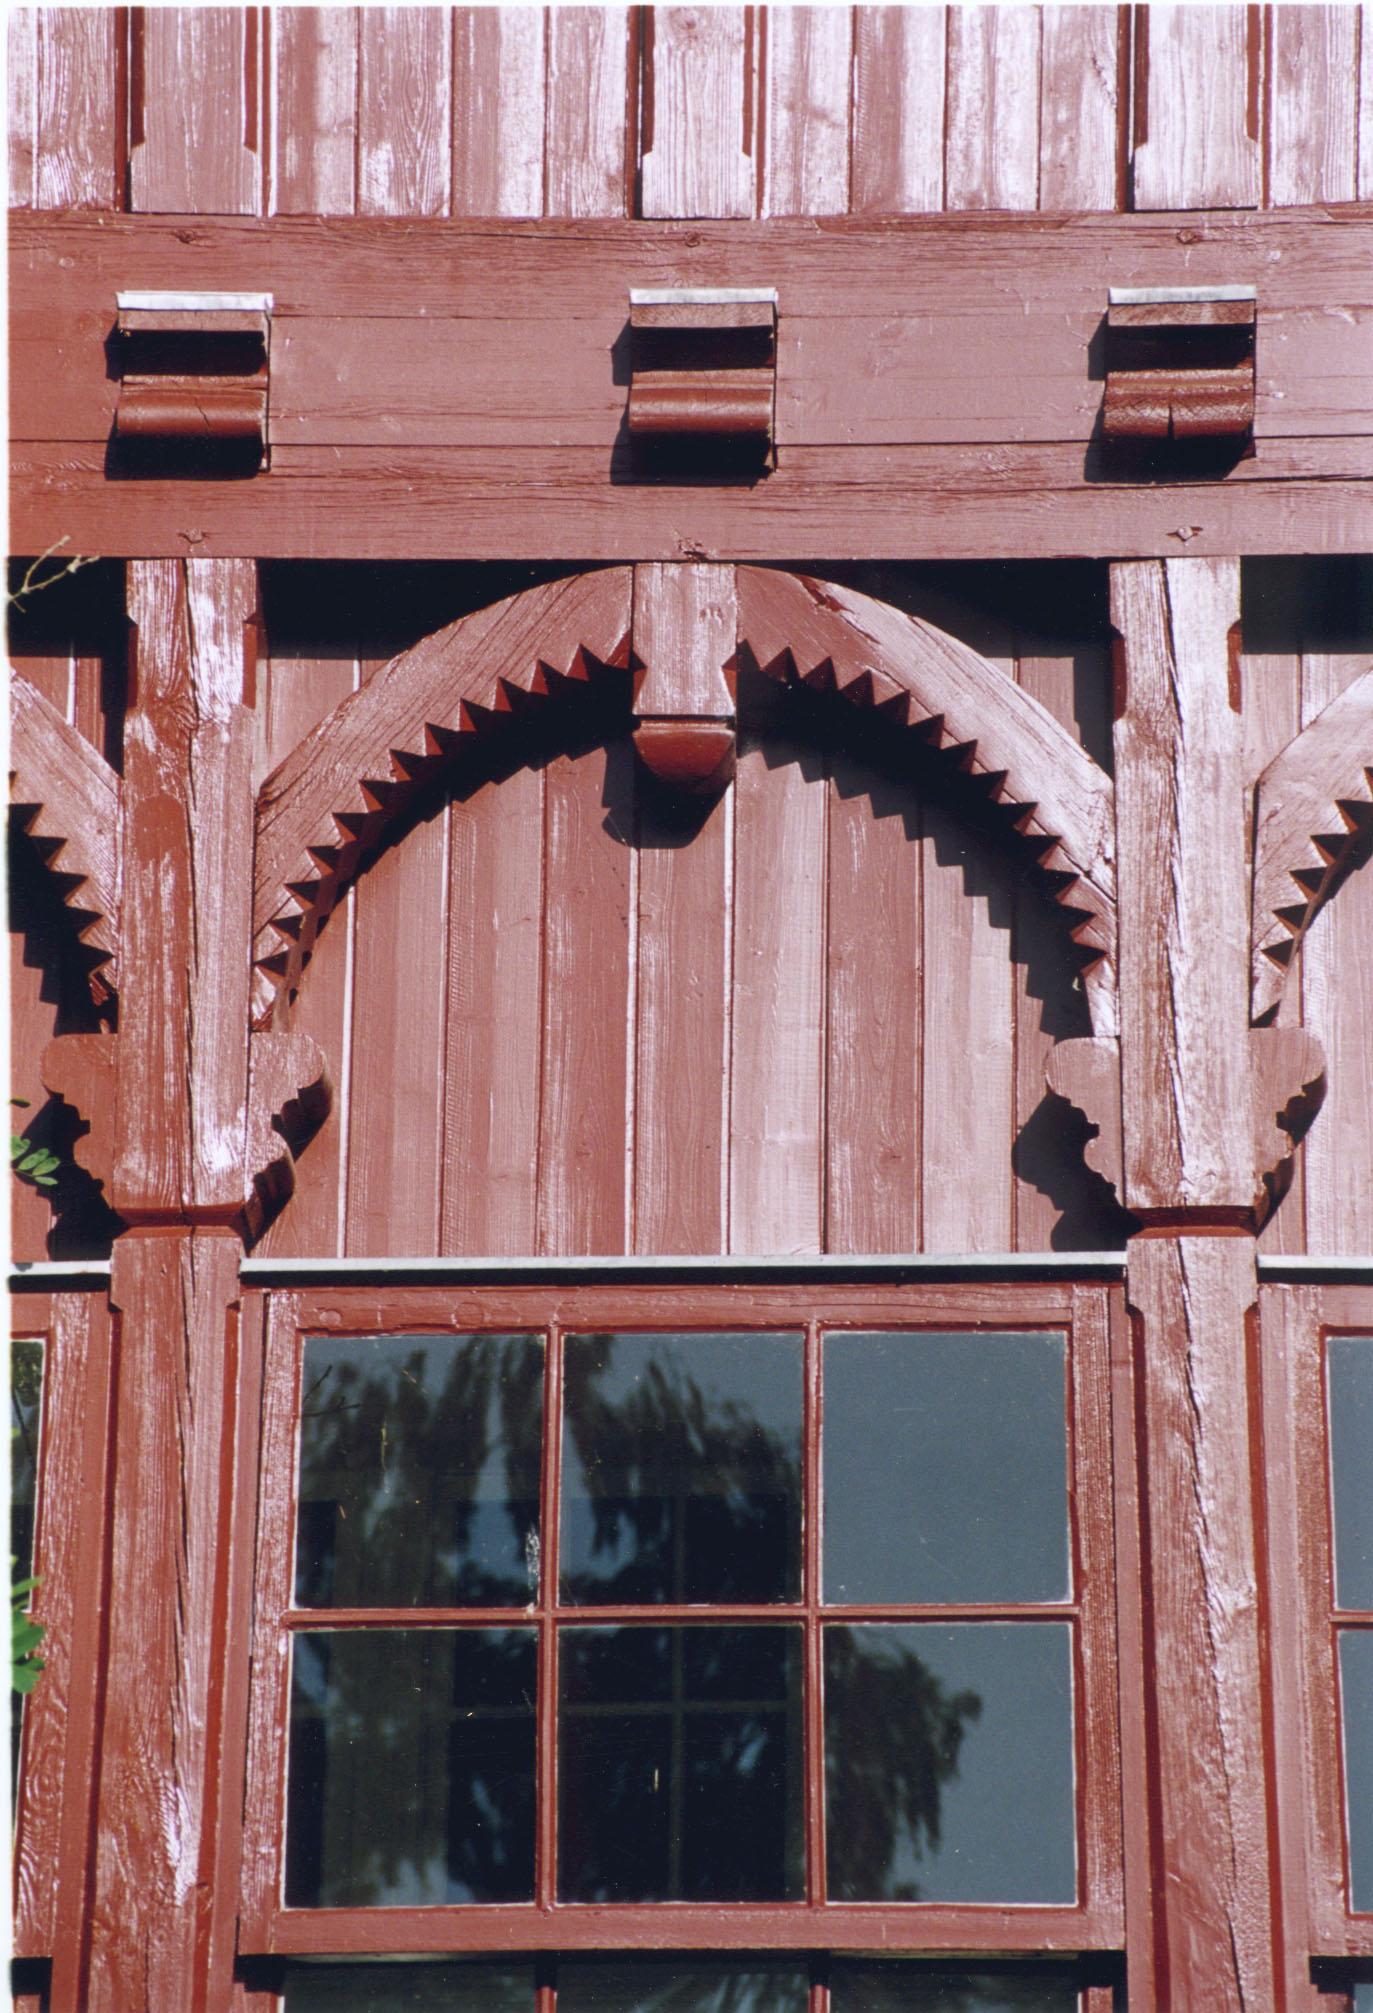 Fenster detail | Photo: Sven Hoffmann